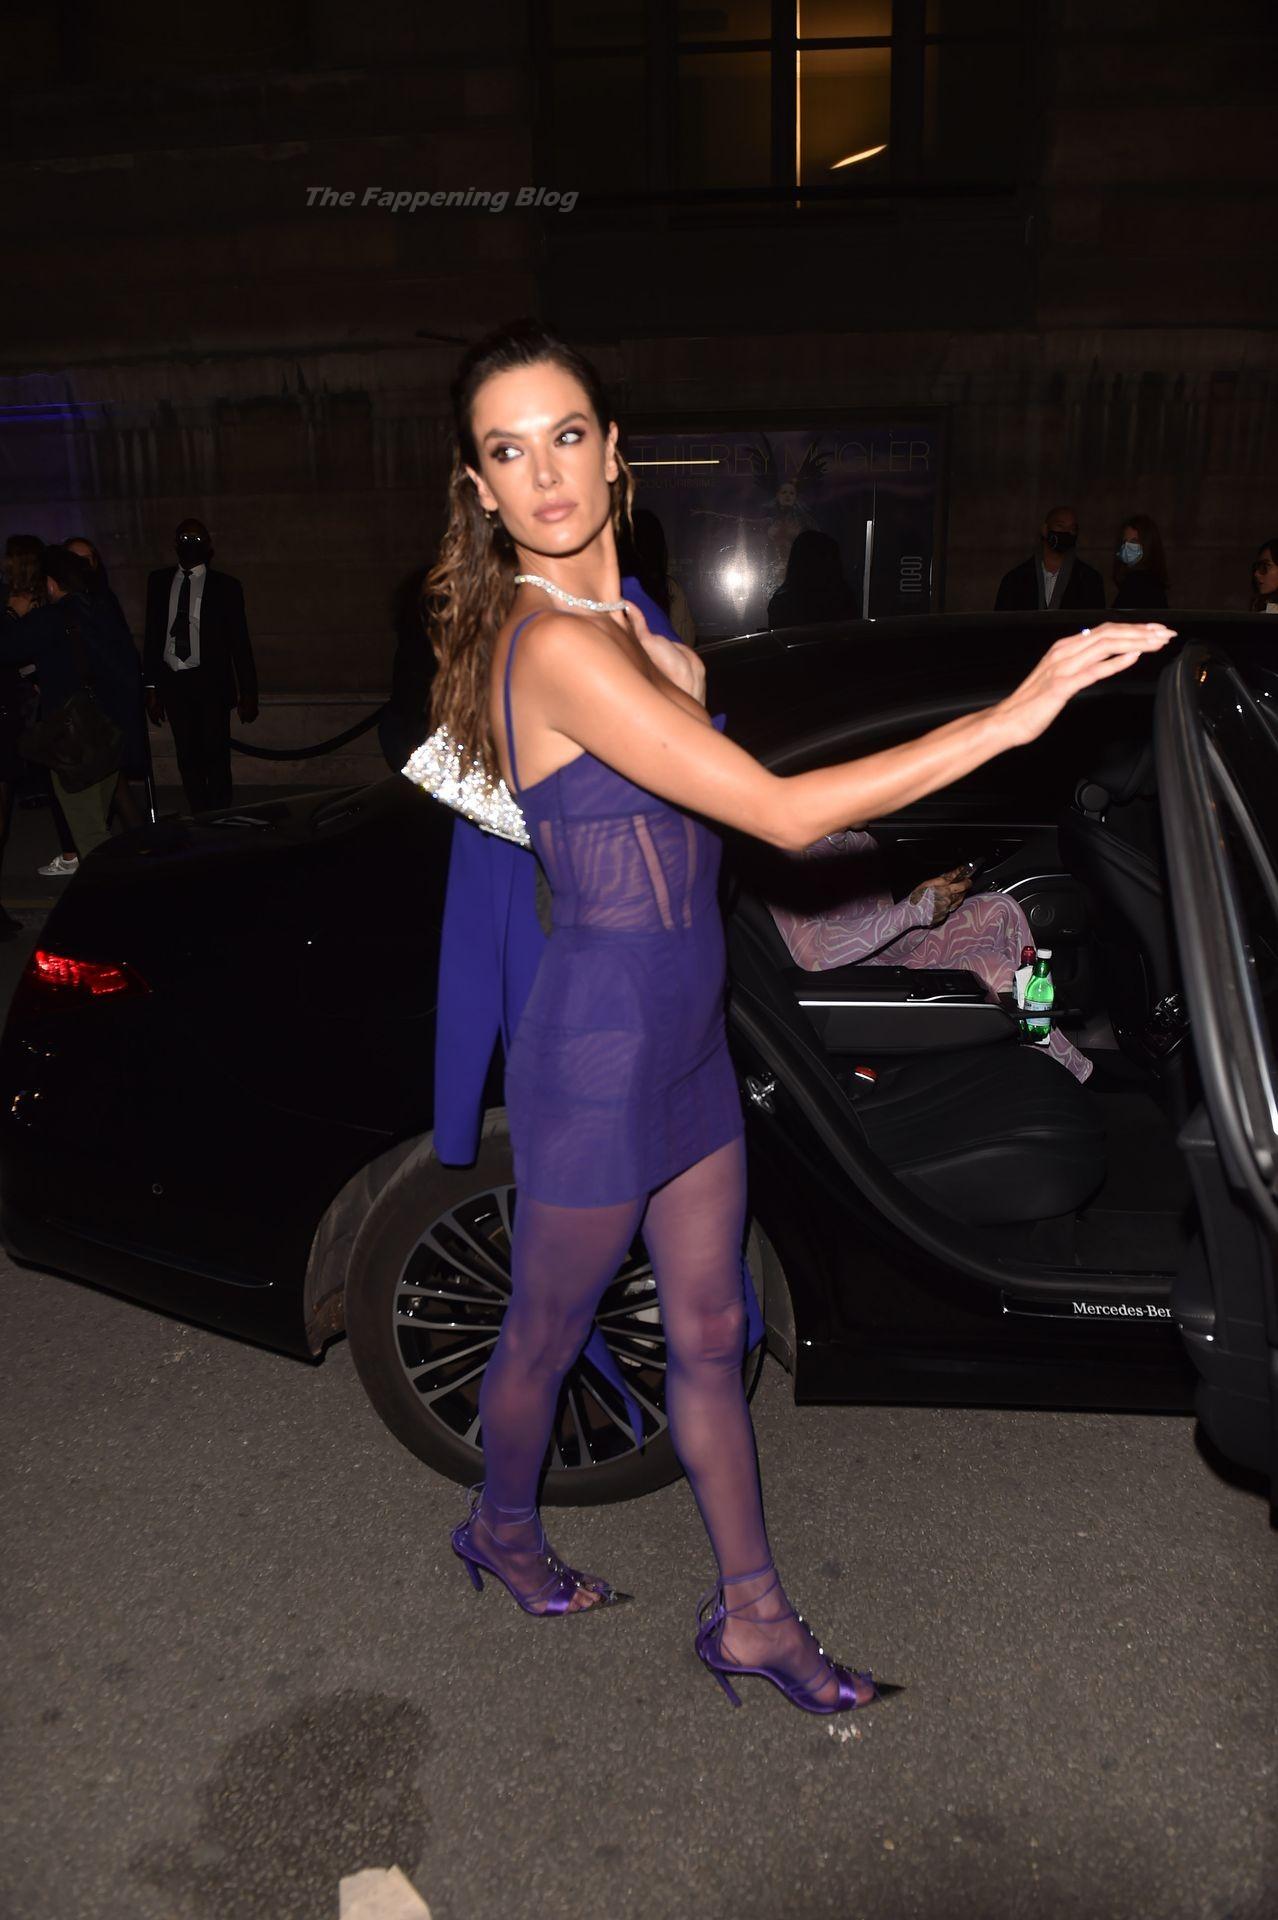 Alessandra-Ambrosio-Sexy-The-Fappening-Blog-86-1.jpg